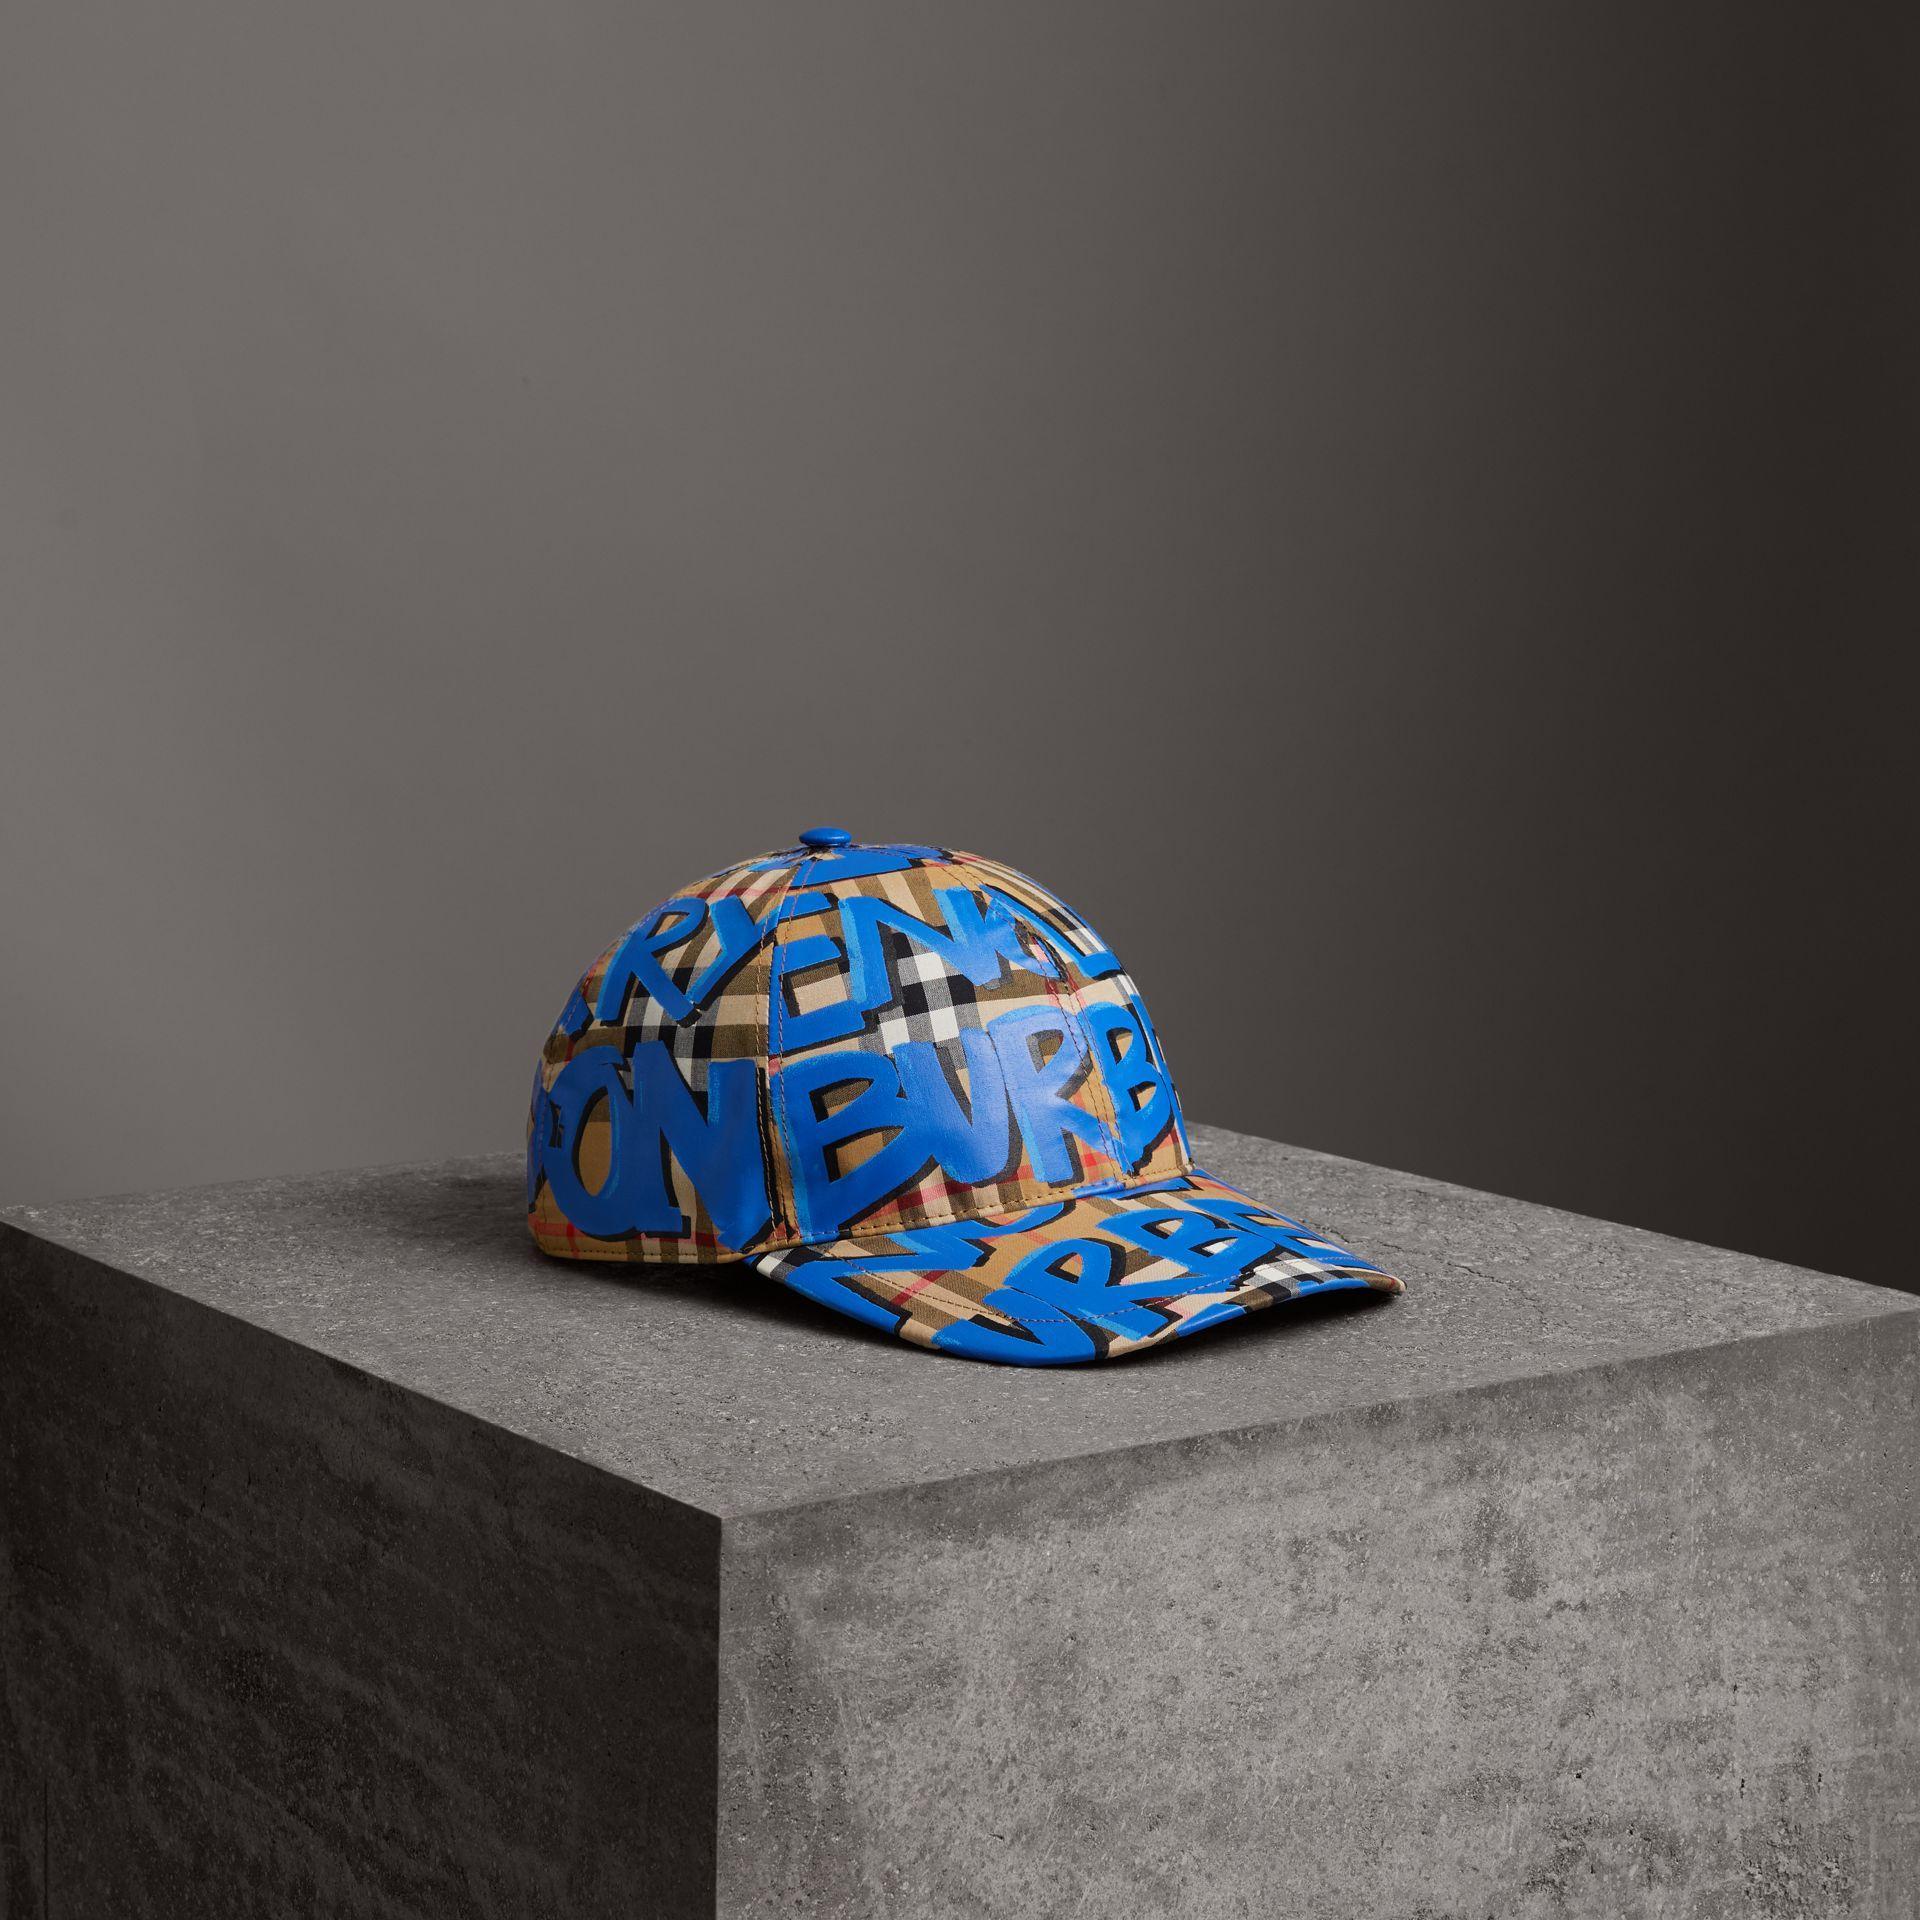 fcb048dcbe8 Burberry Graffiti Print Vintage Check Baseball Cap In Blue